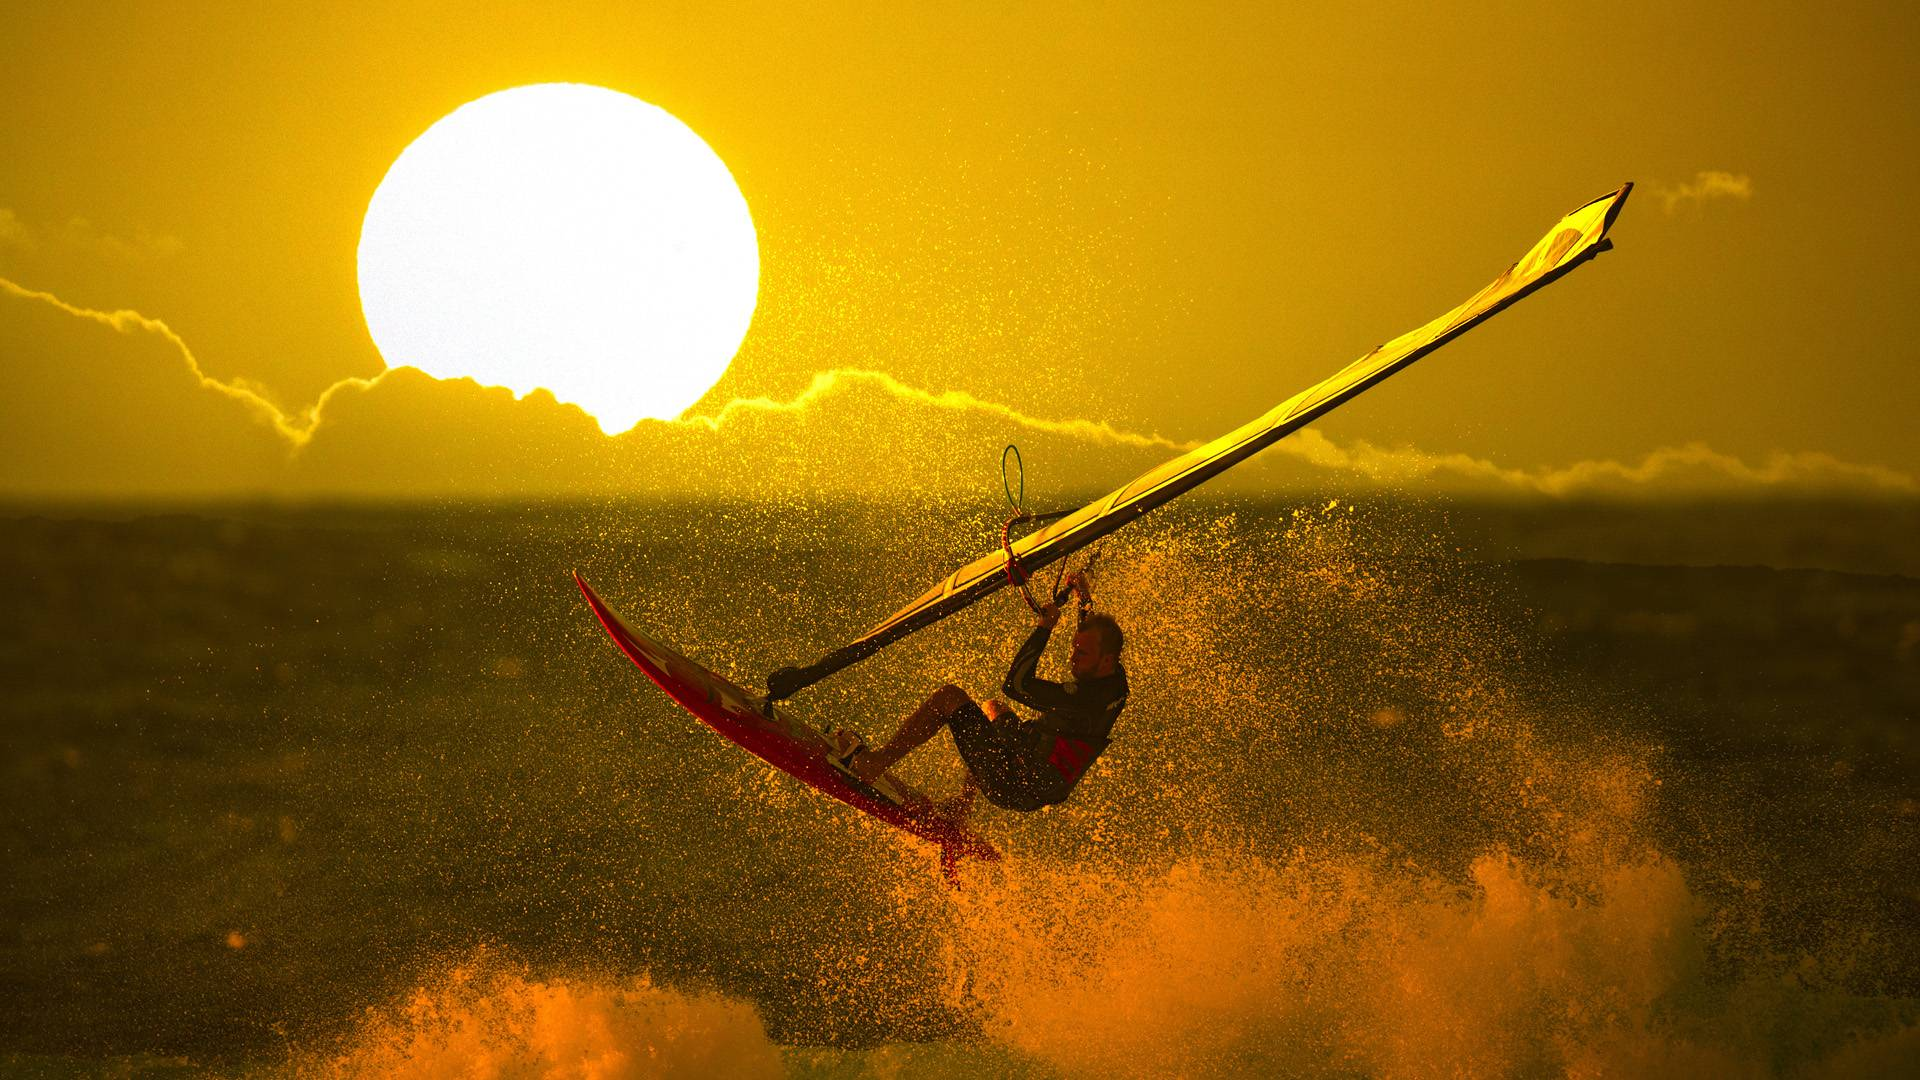 Обои Виндсёрфинг, закат, большое солнце